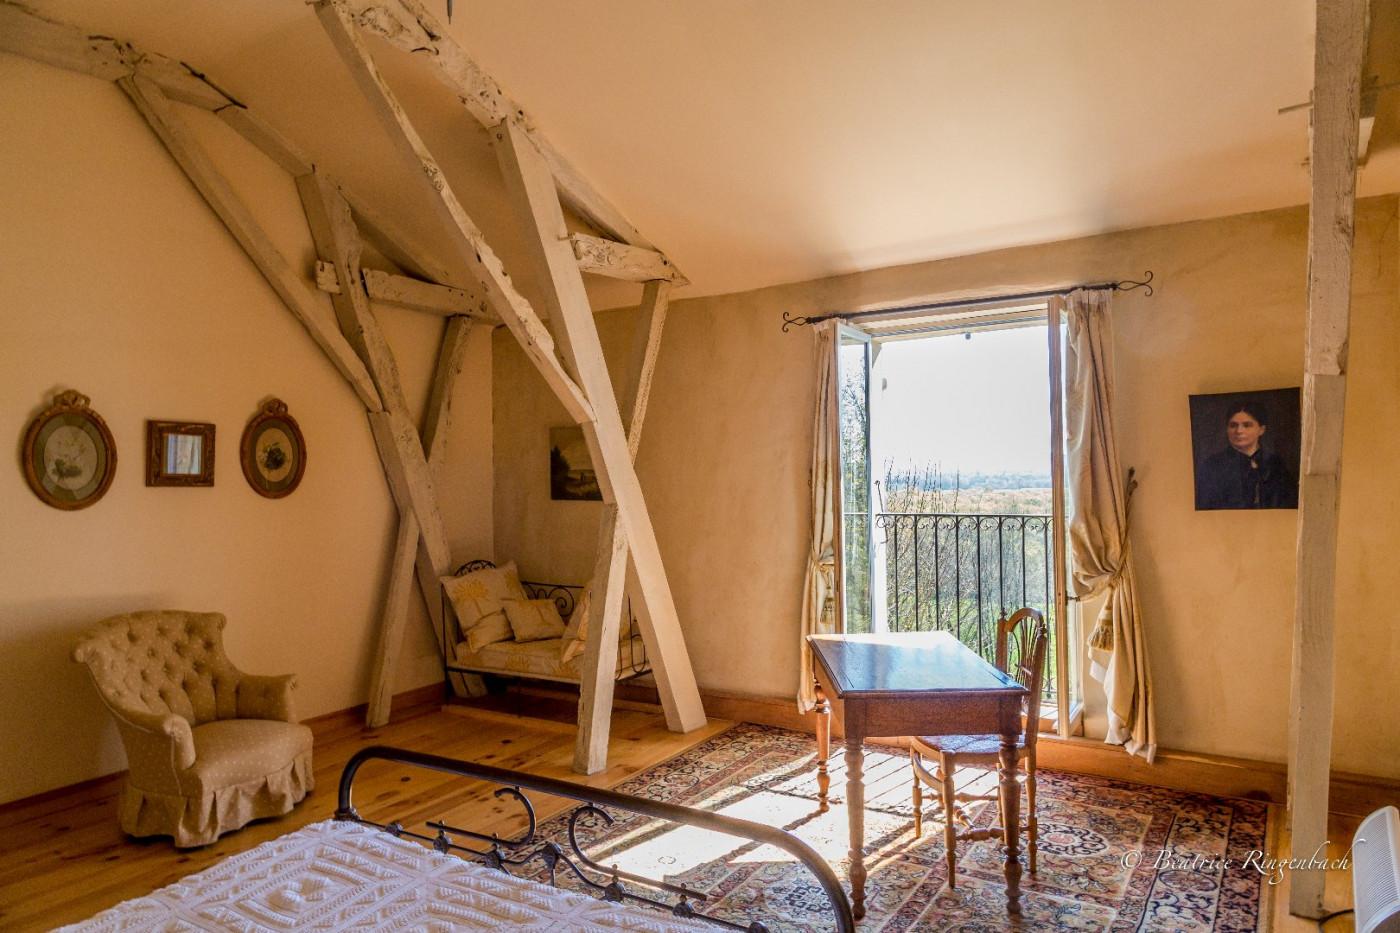 A vendre  Aignan | Réf 320072006 - L'occitane immobilier